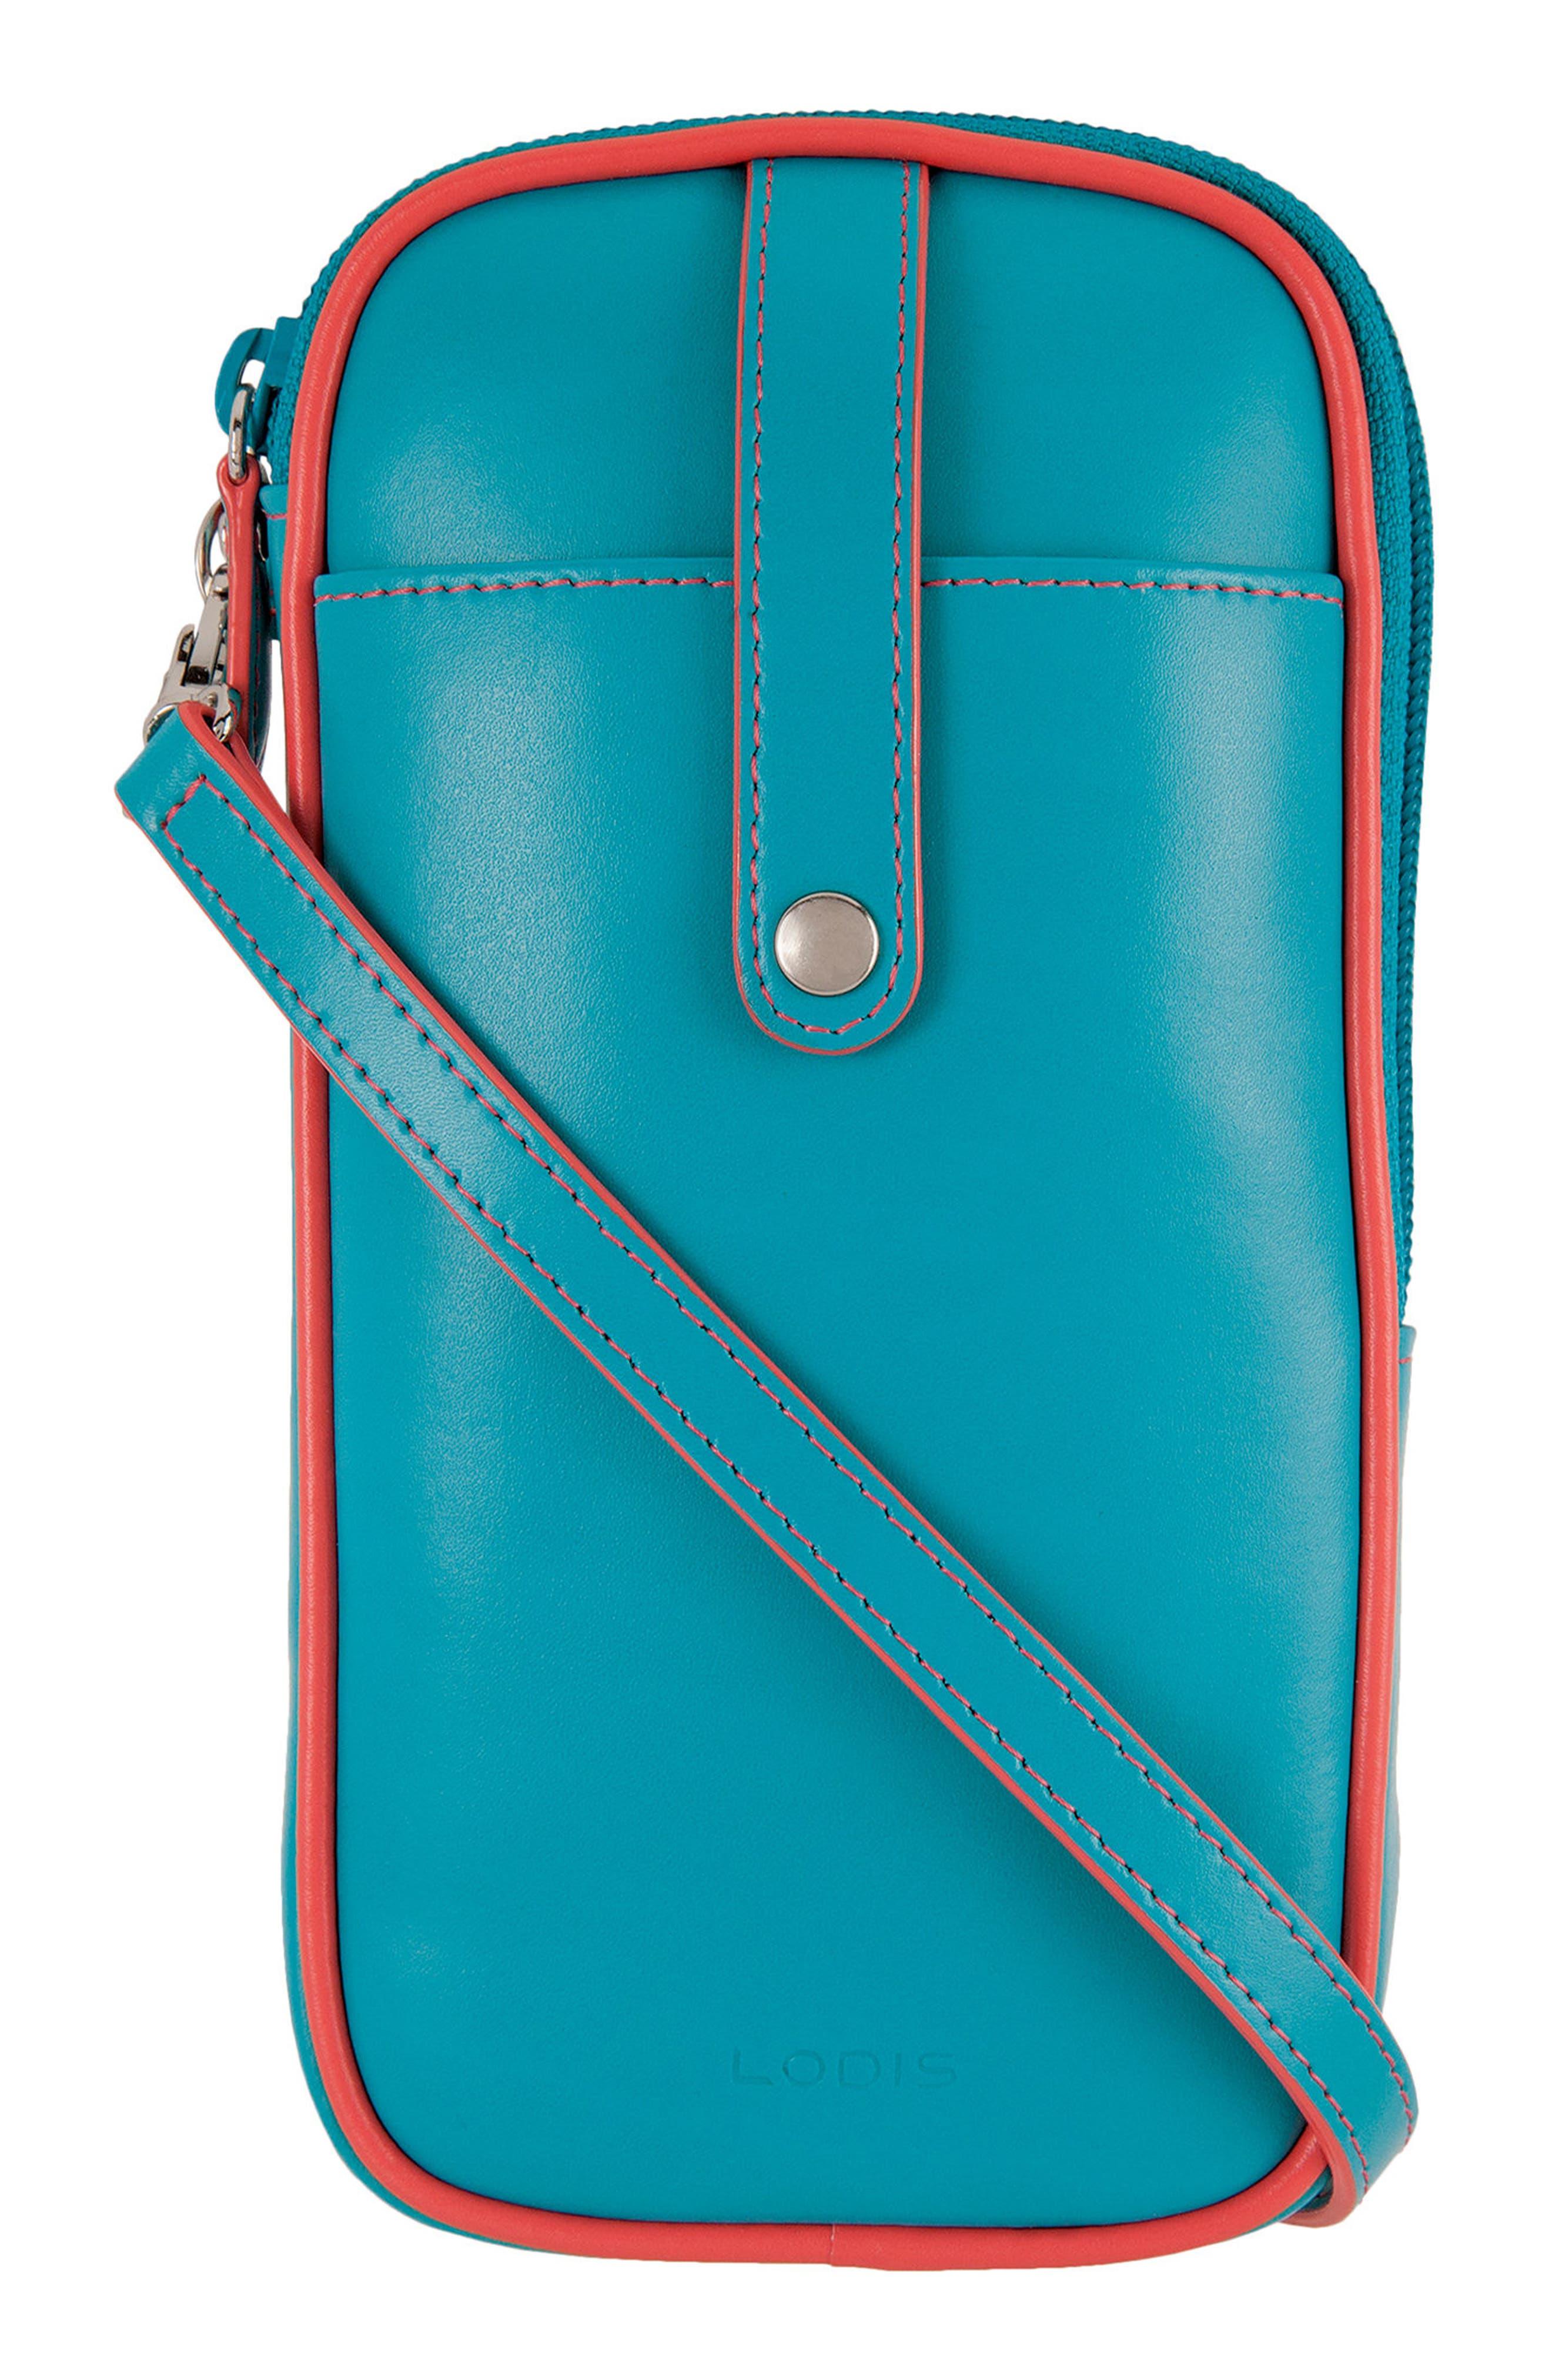 Lodis Mini Audrey Blossom Leather Crossbody Bag